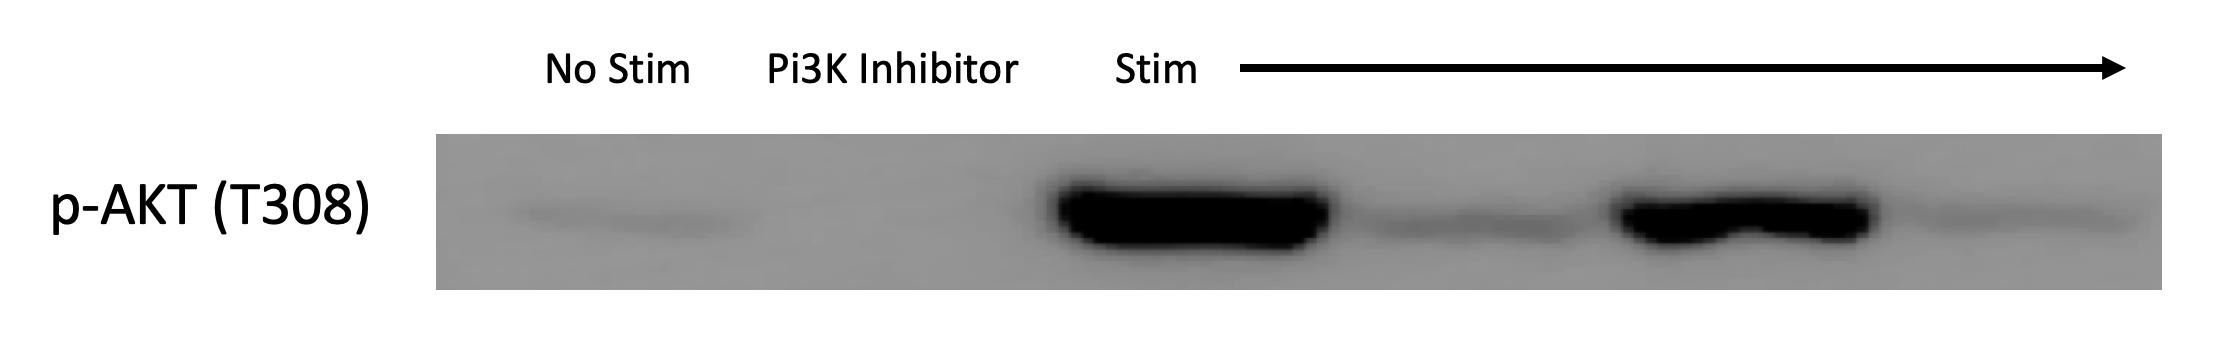 Reliable Antibody to Detect PI3K Activity